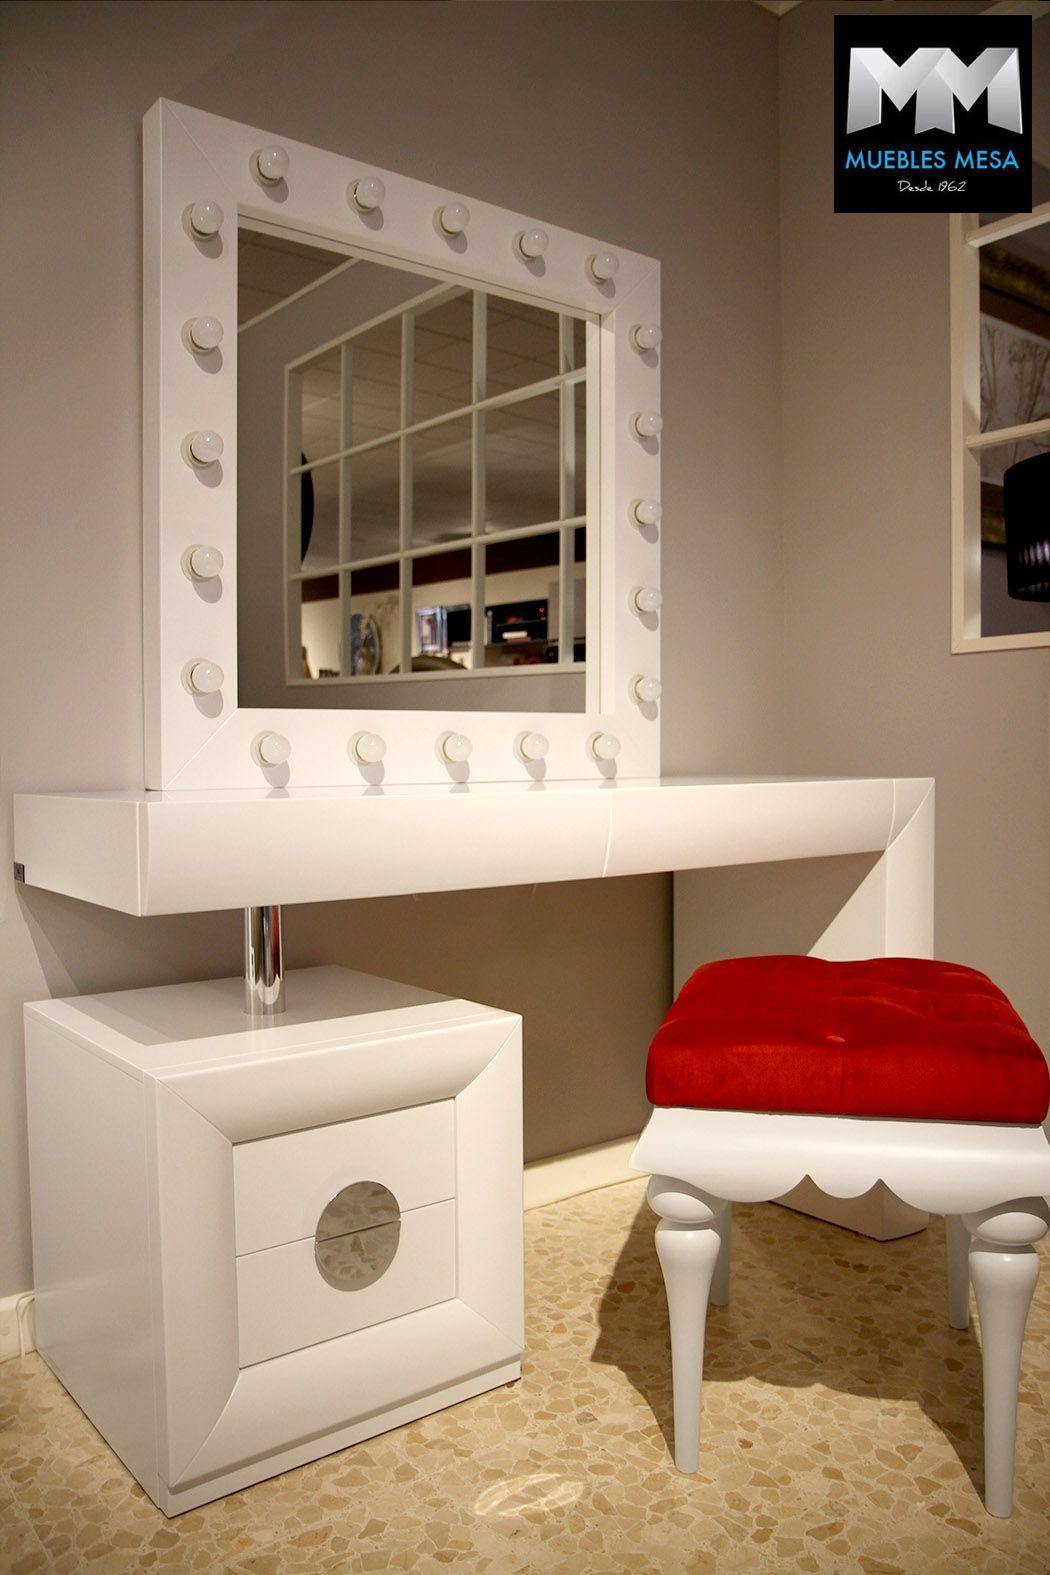 Tocador Vanitychest Vanitydesk Tocadores Franco Furniture En La  # Muebles Furniture